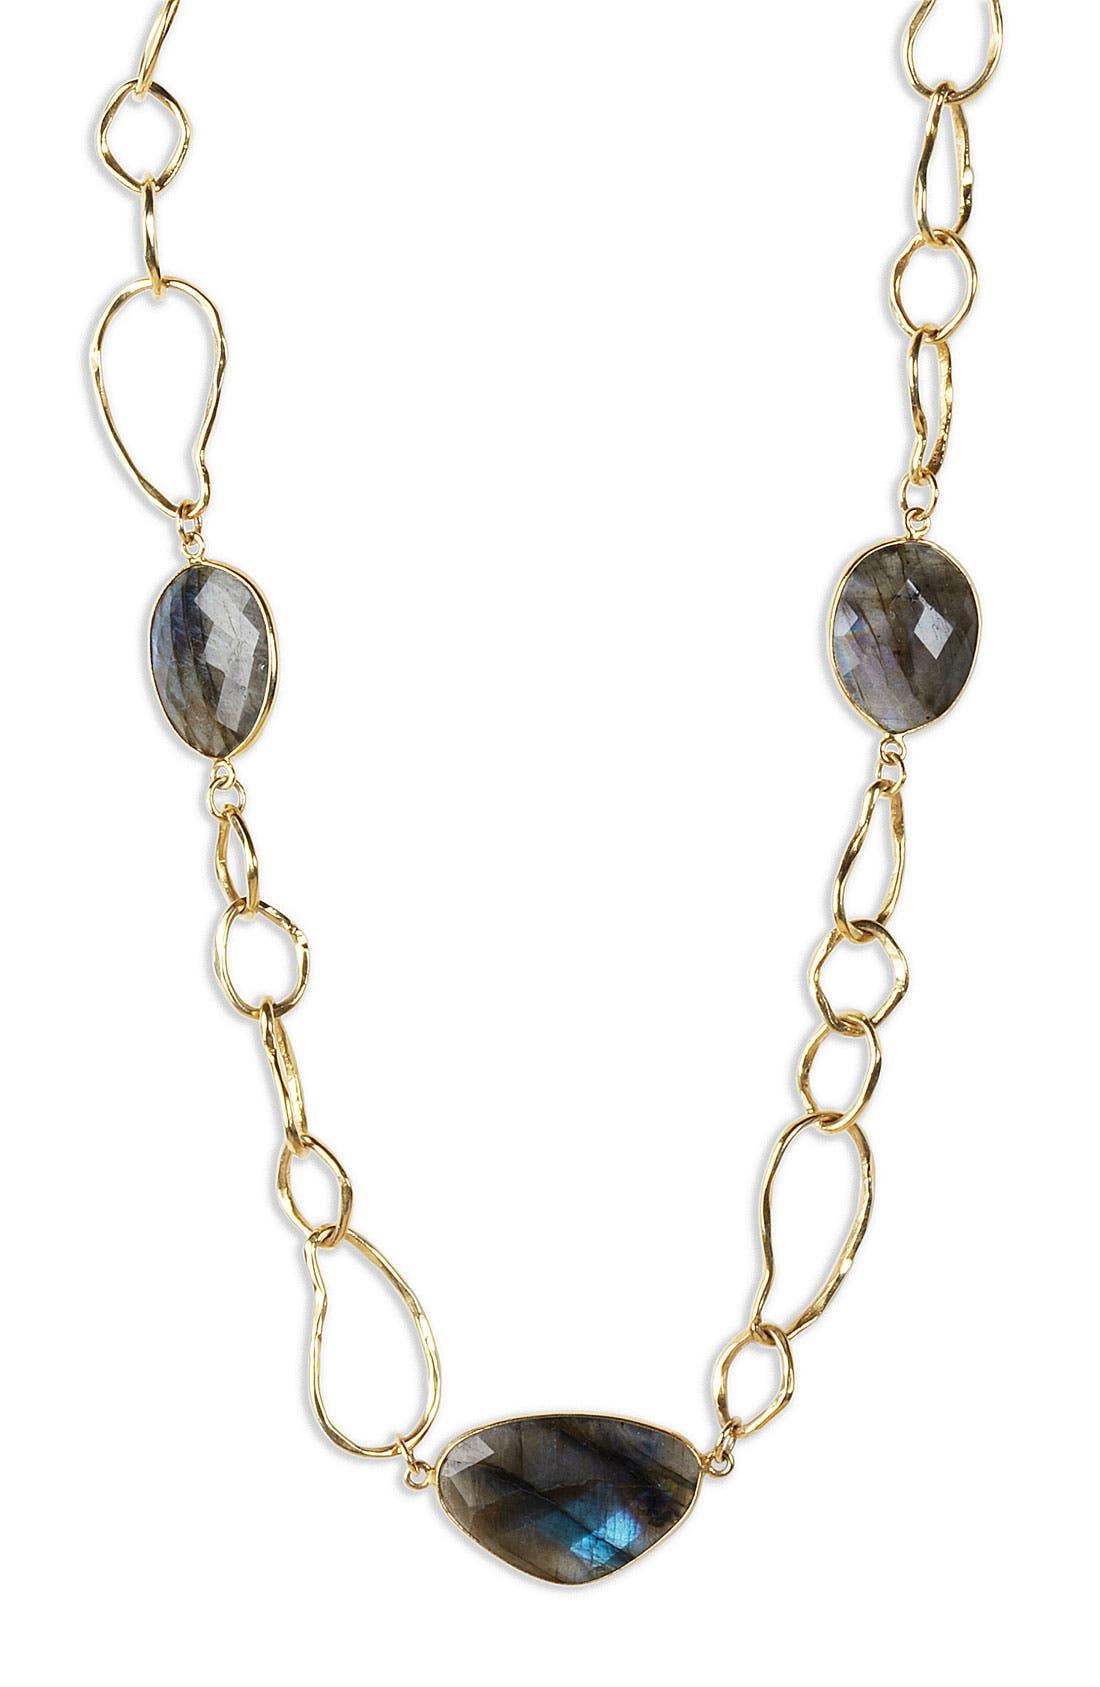 Alternate Image 1 Selected - Argento Vivo 'Waltzing Metal' Stone Station Link Necklace